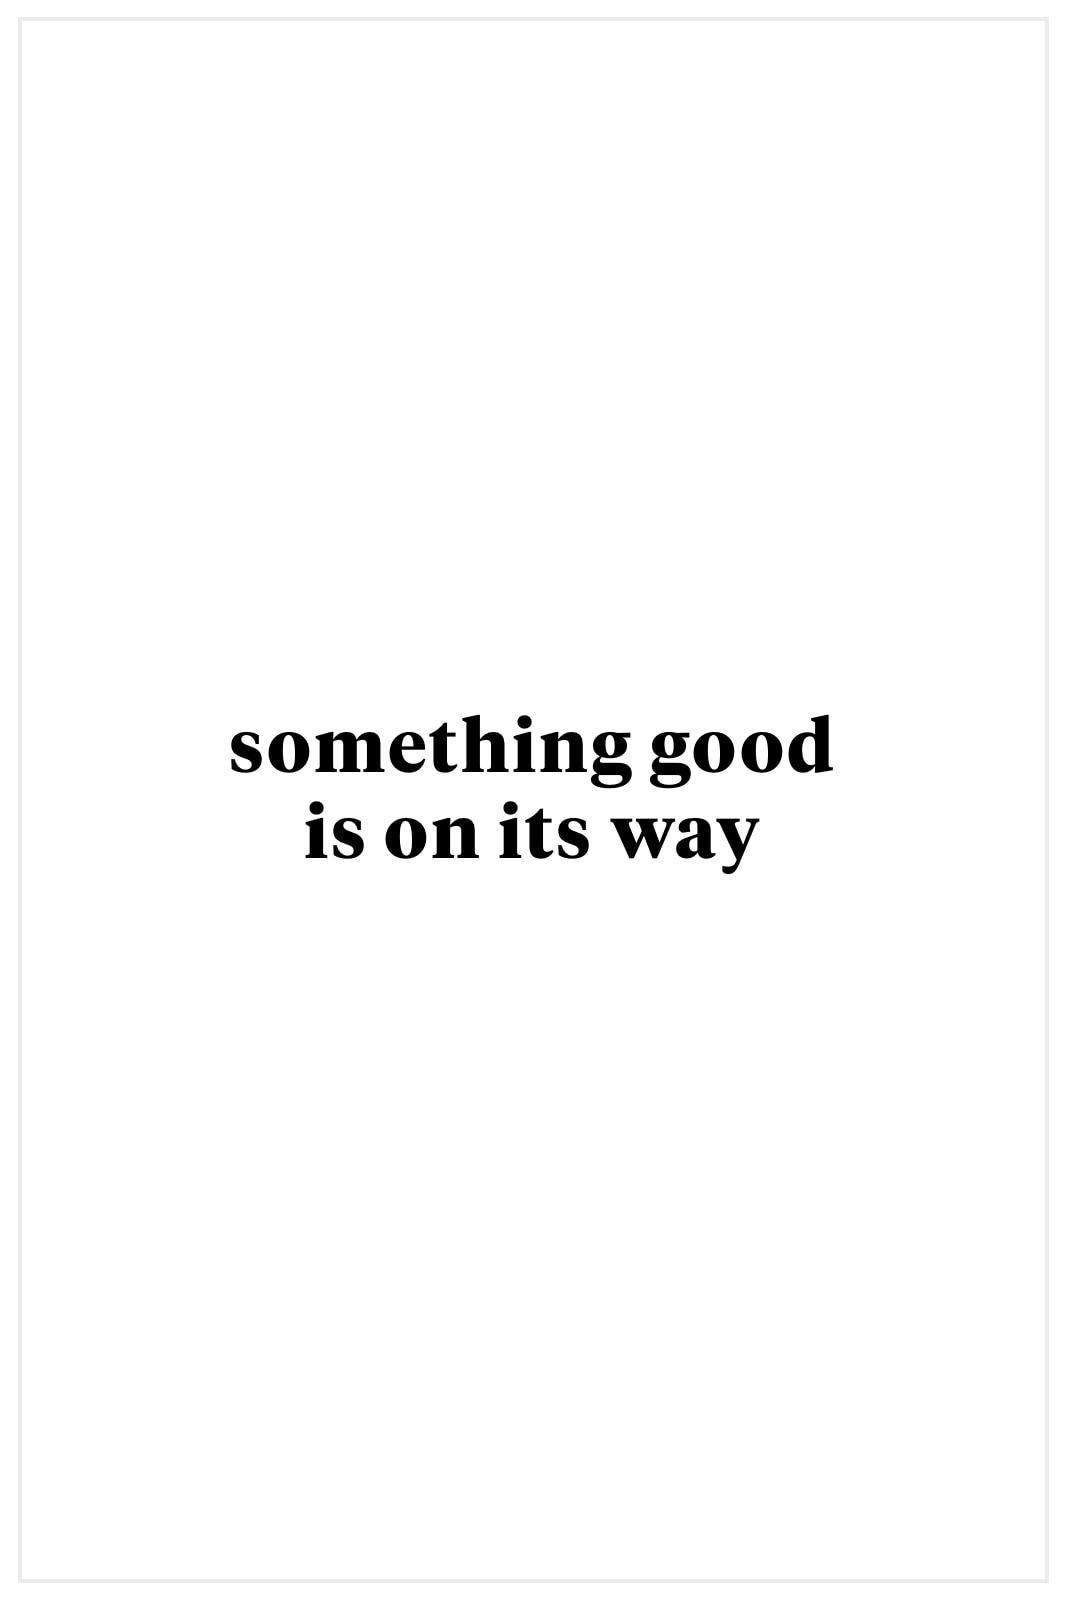 Harriet isles Lariat Gem Stone Necklace